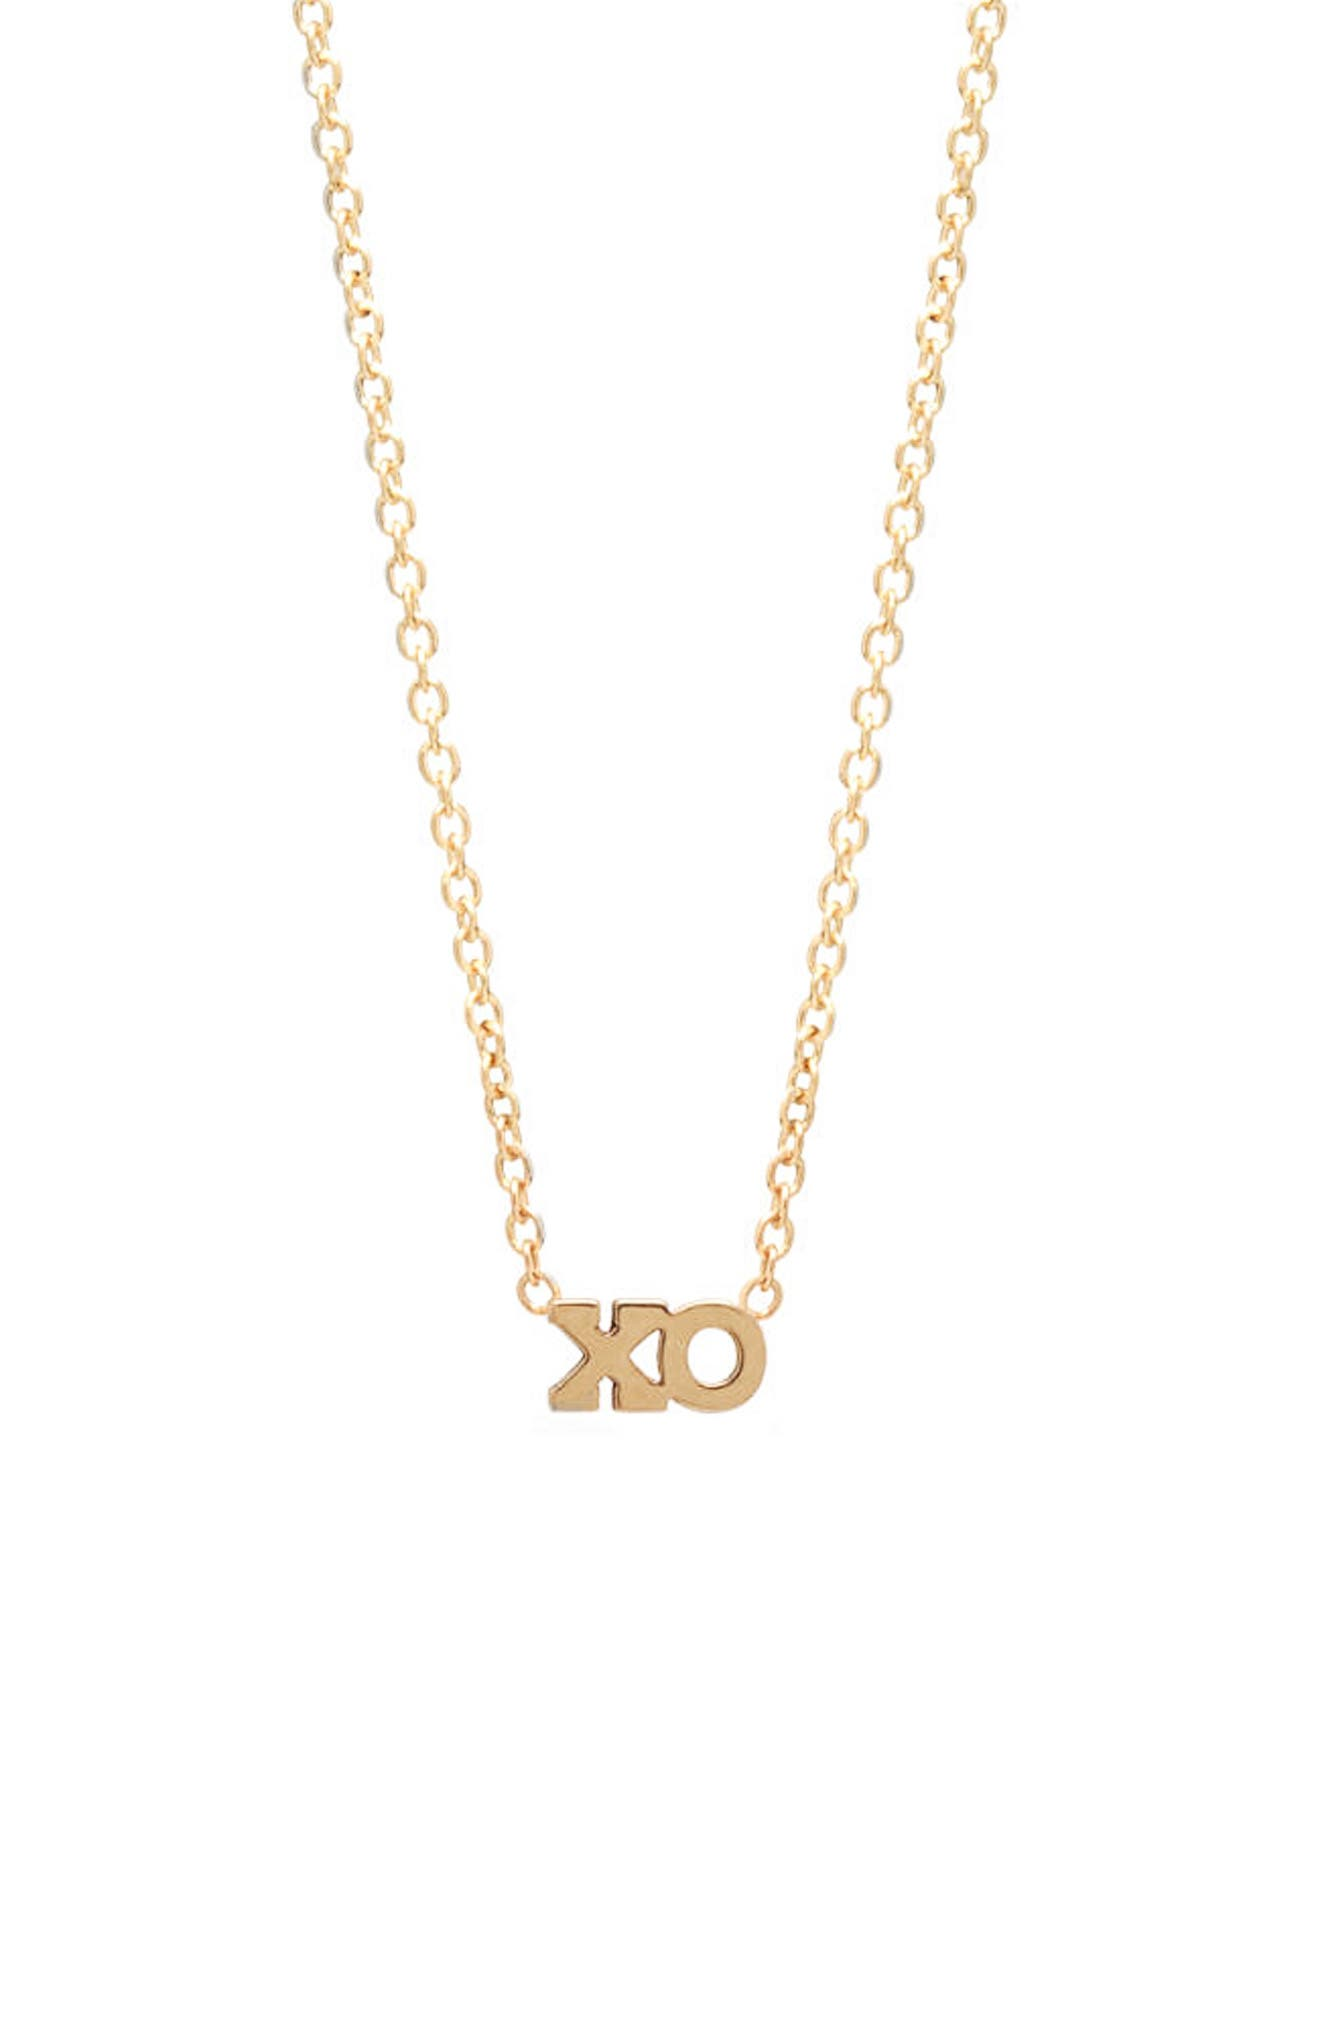 XO Pendant Necklace,                         Main,                         color, Yellow Gold